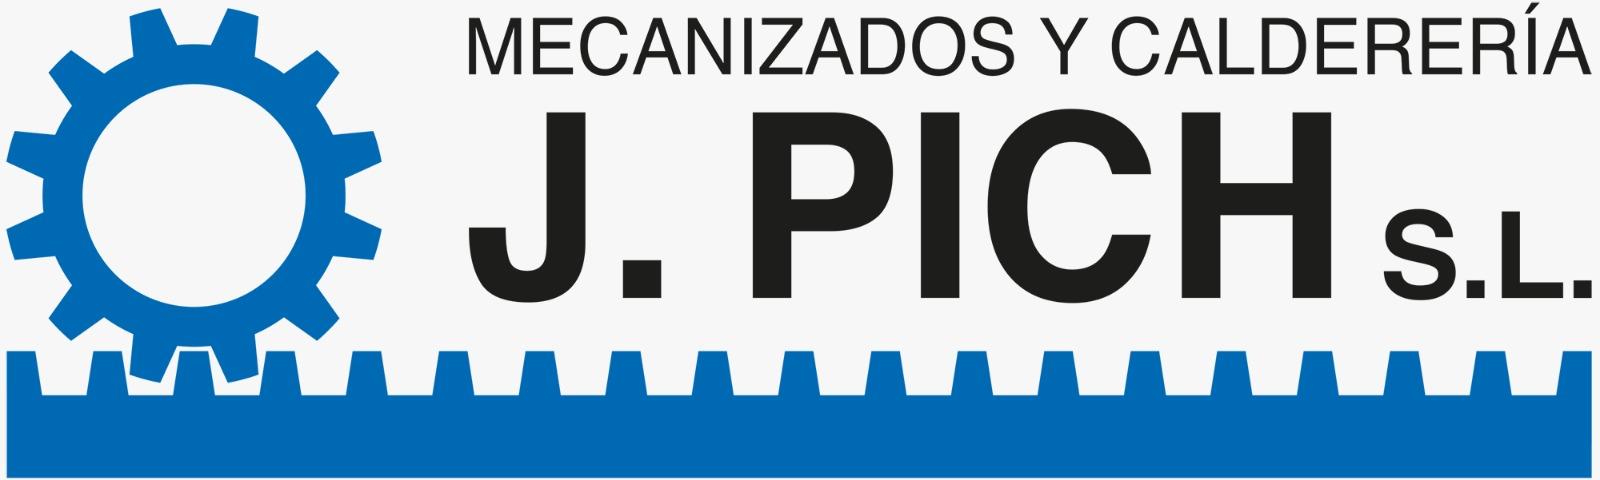 MECANIZADOS Y CALDERERIA J.PICH